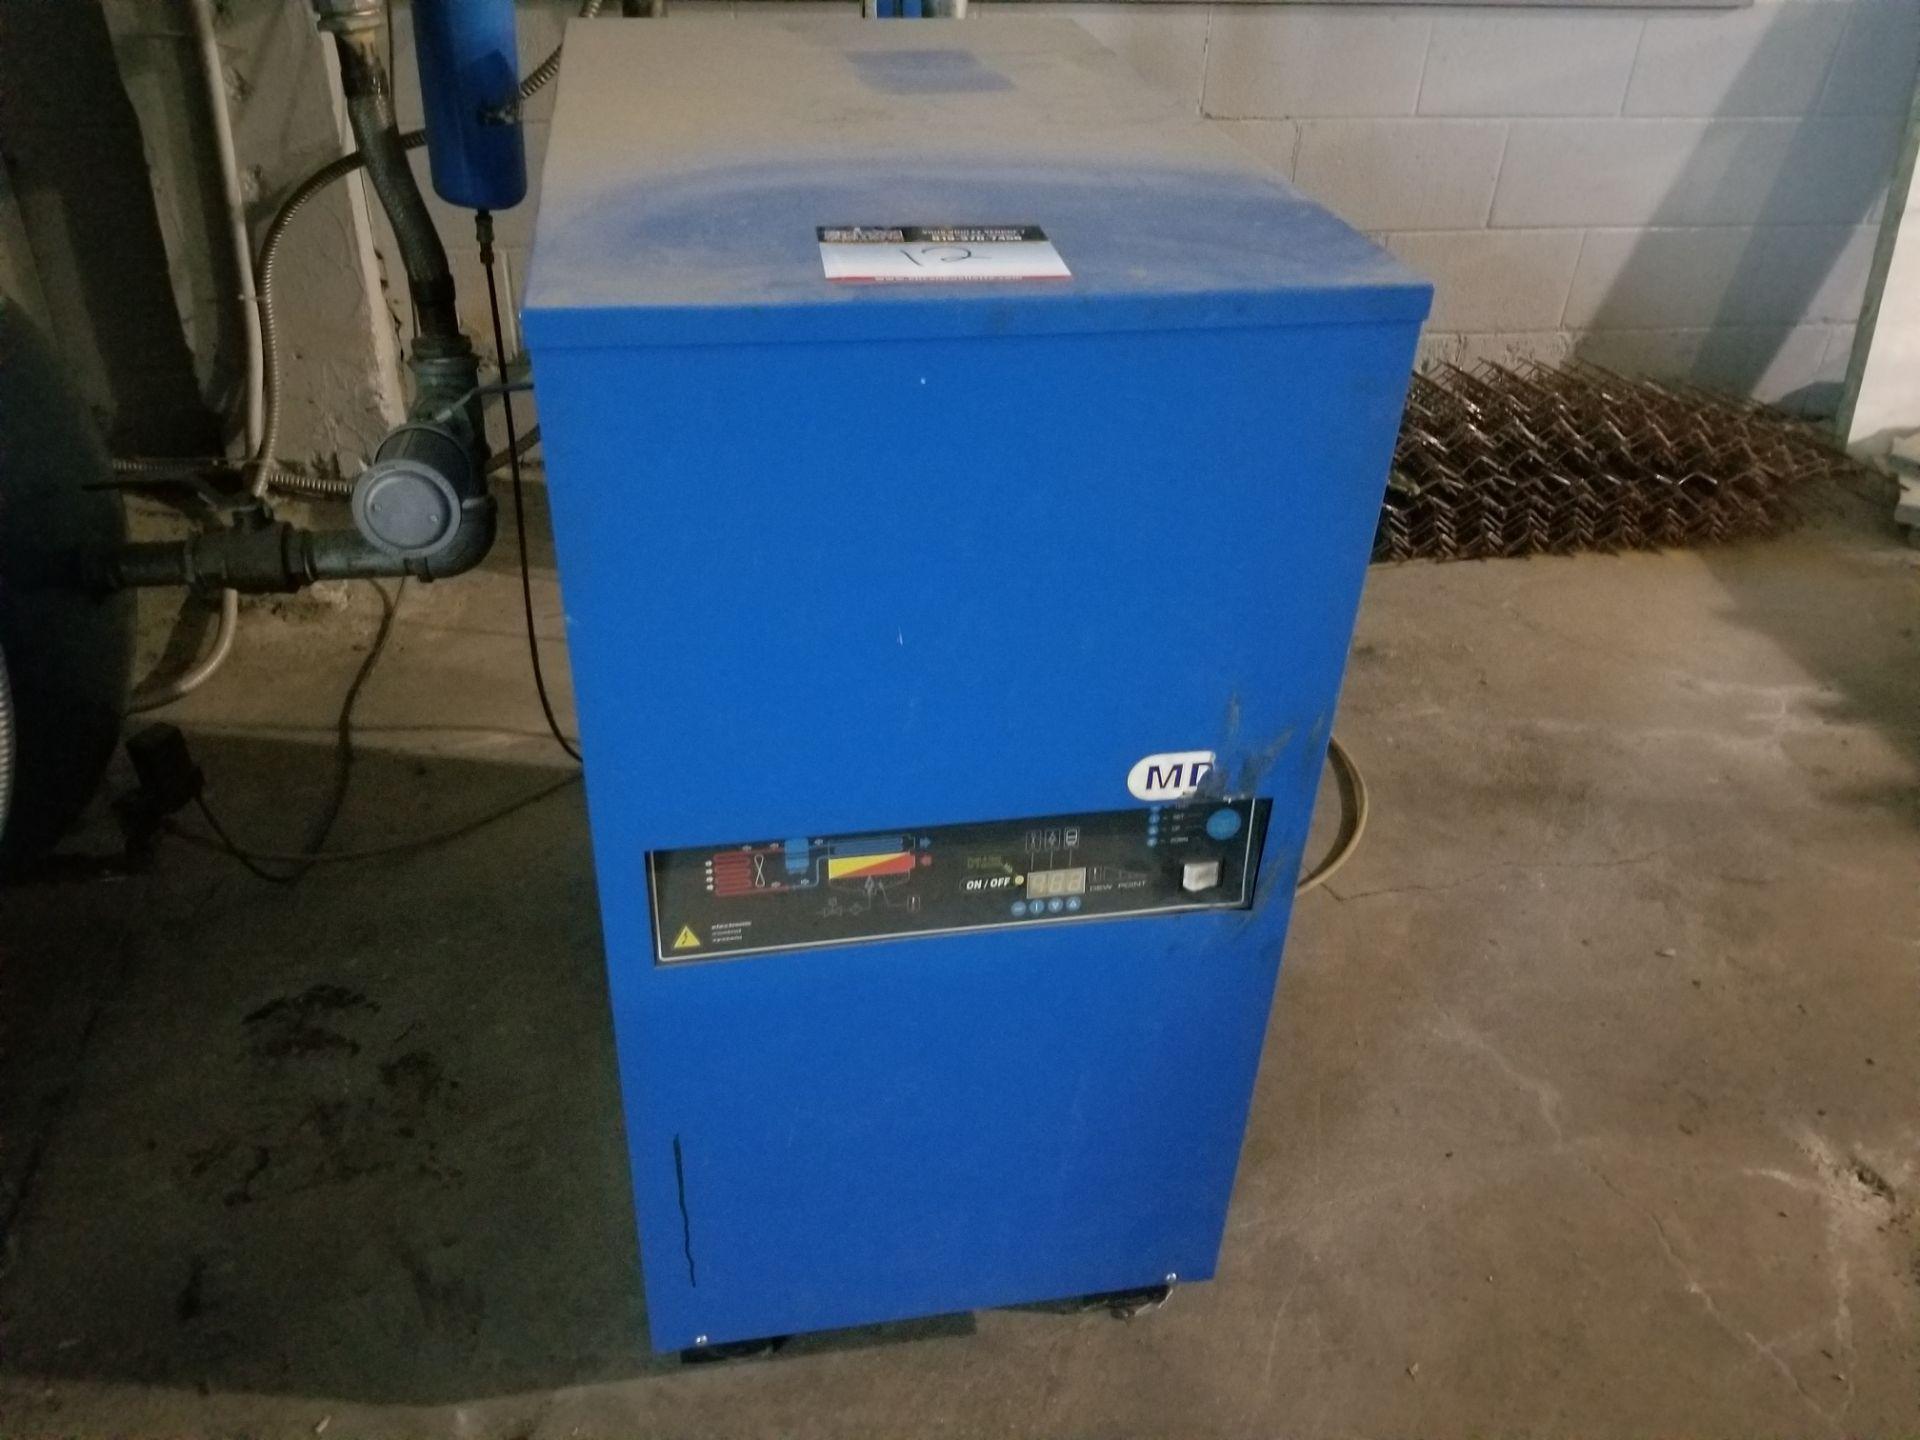 575 volt compressor, dryer, cooler / Compresseur 575 volts, assécheur - Image 3 of 4